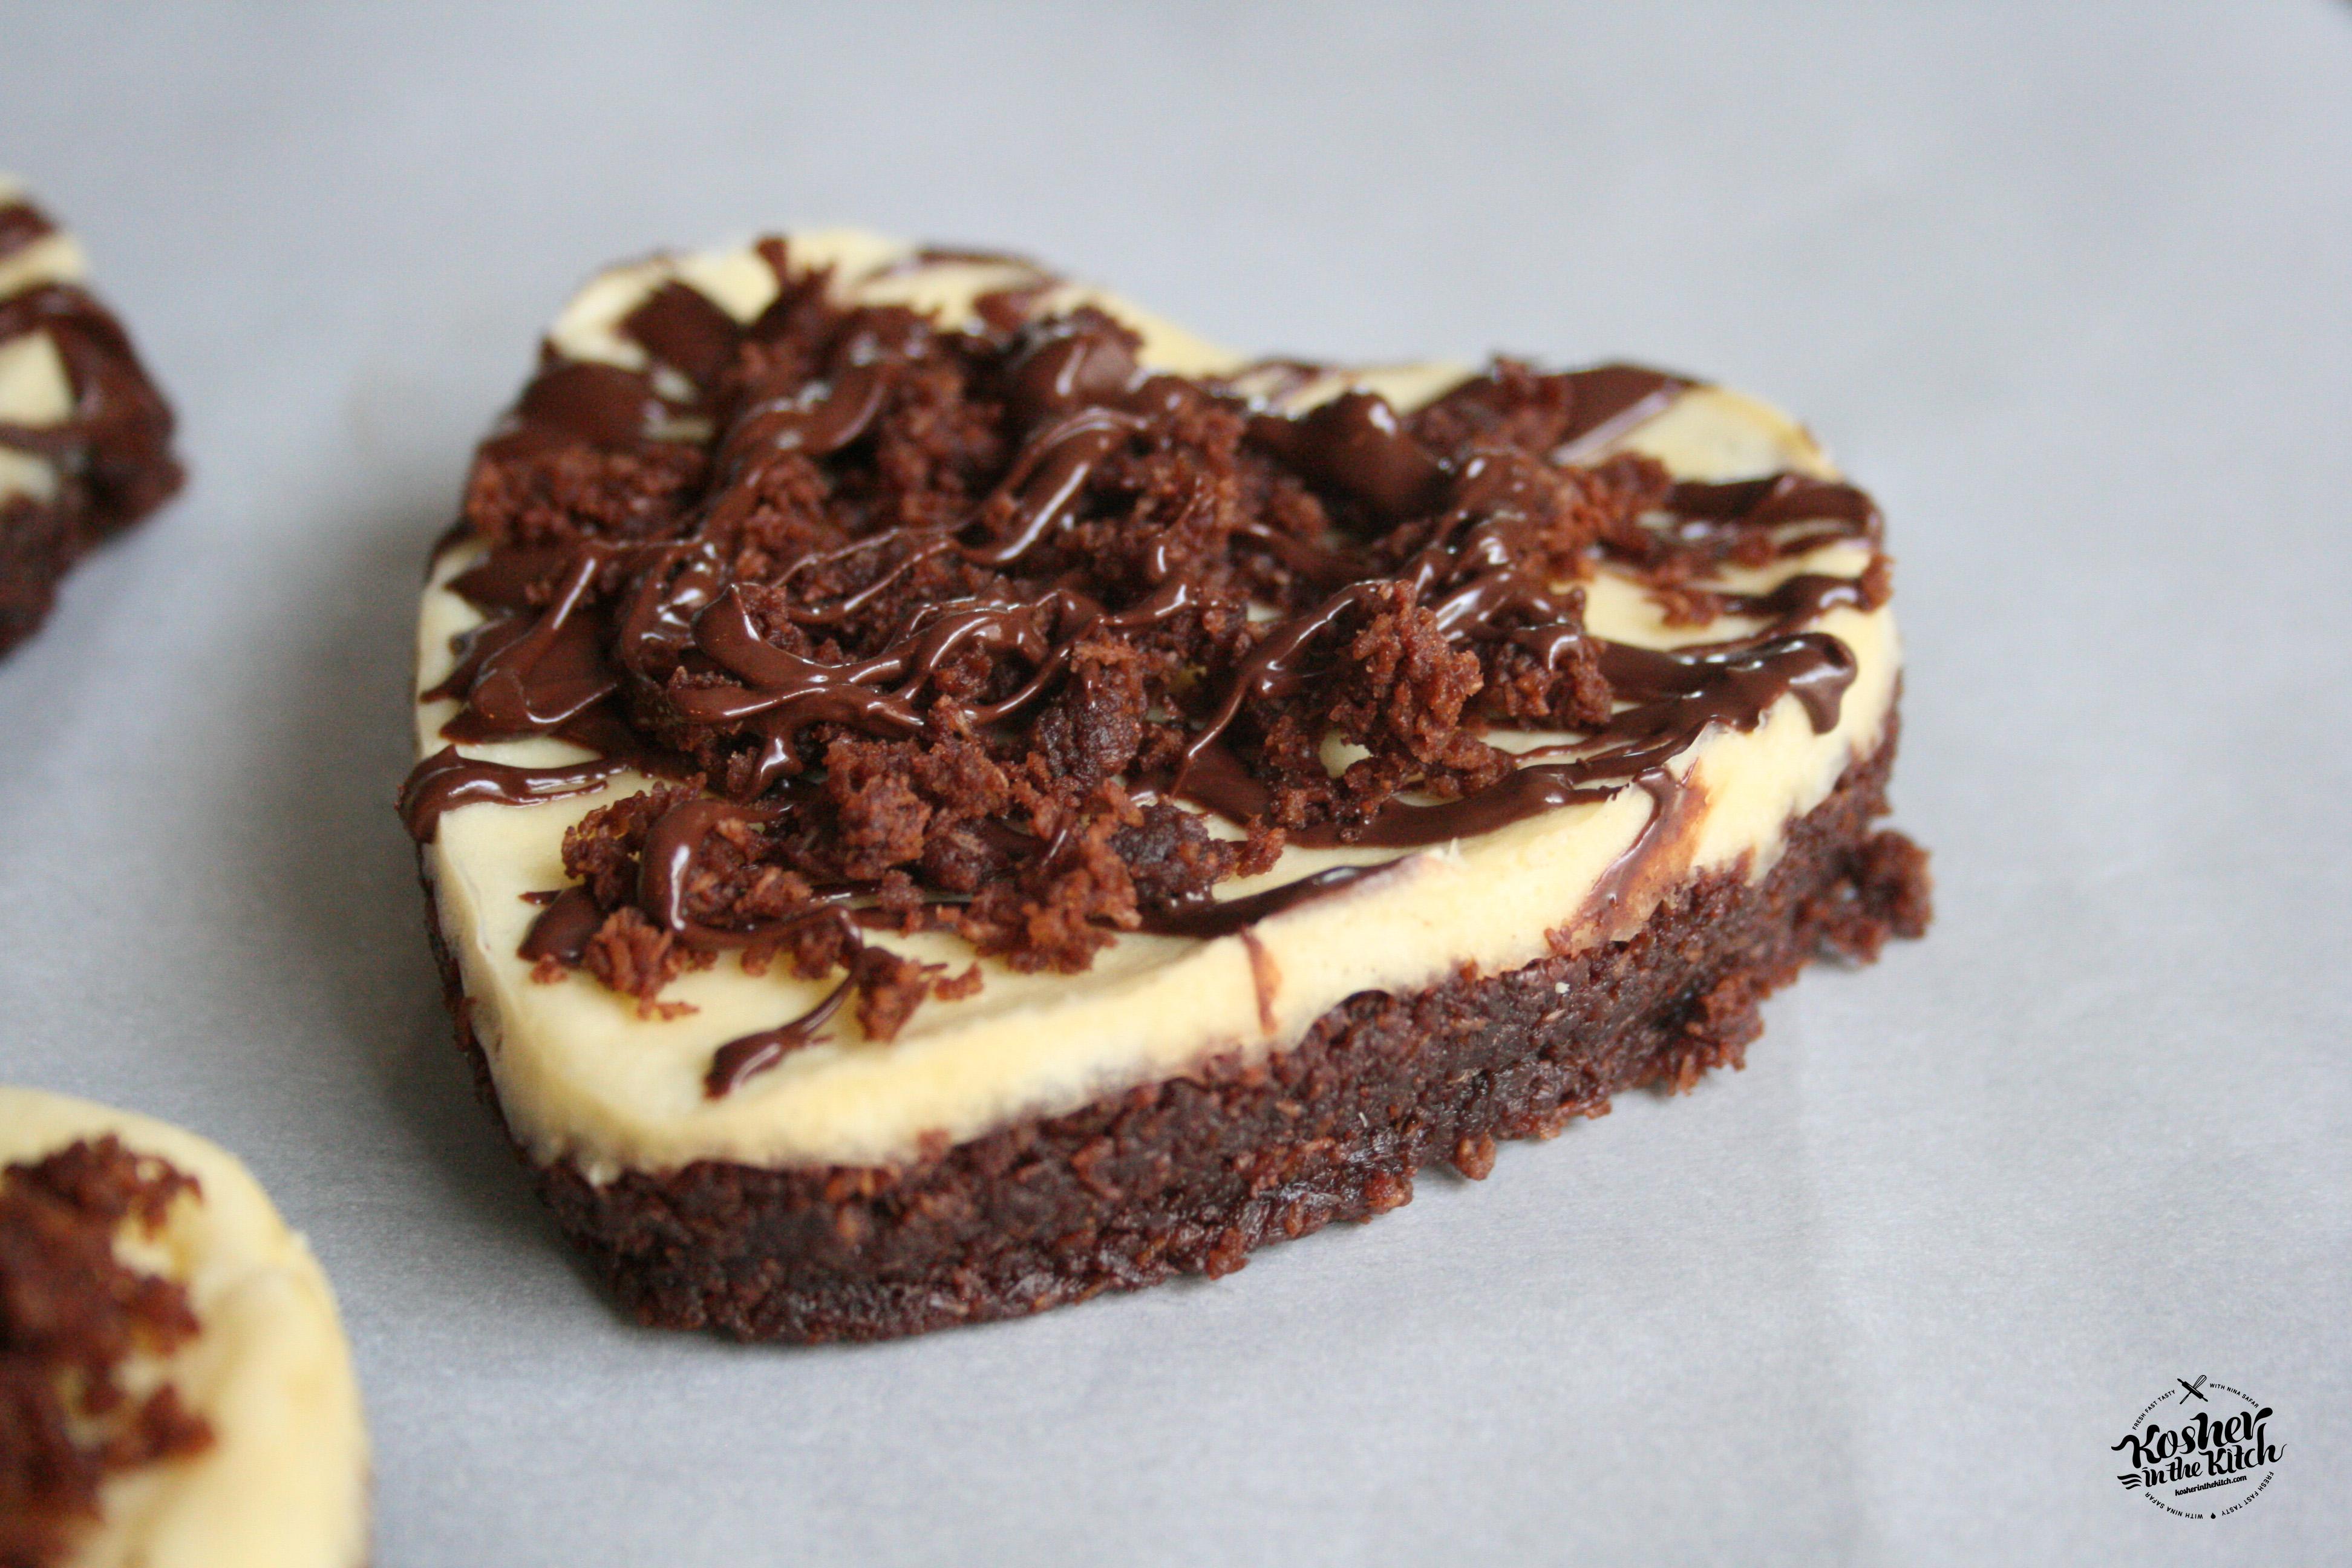 Mint Chocolate Macaroon Cheesecake Kosher In The Kitch